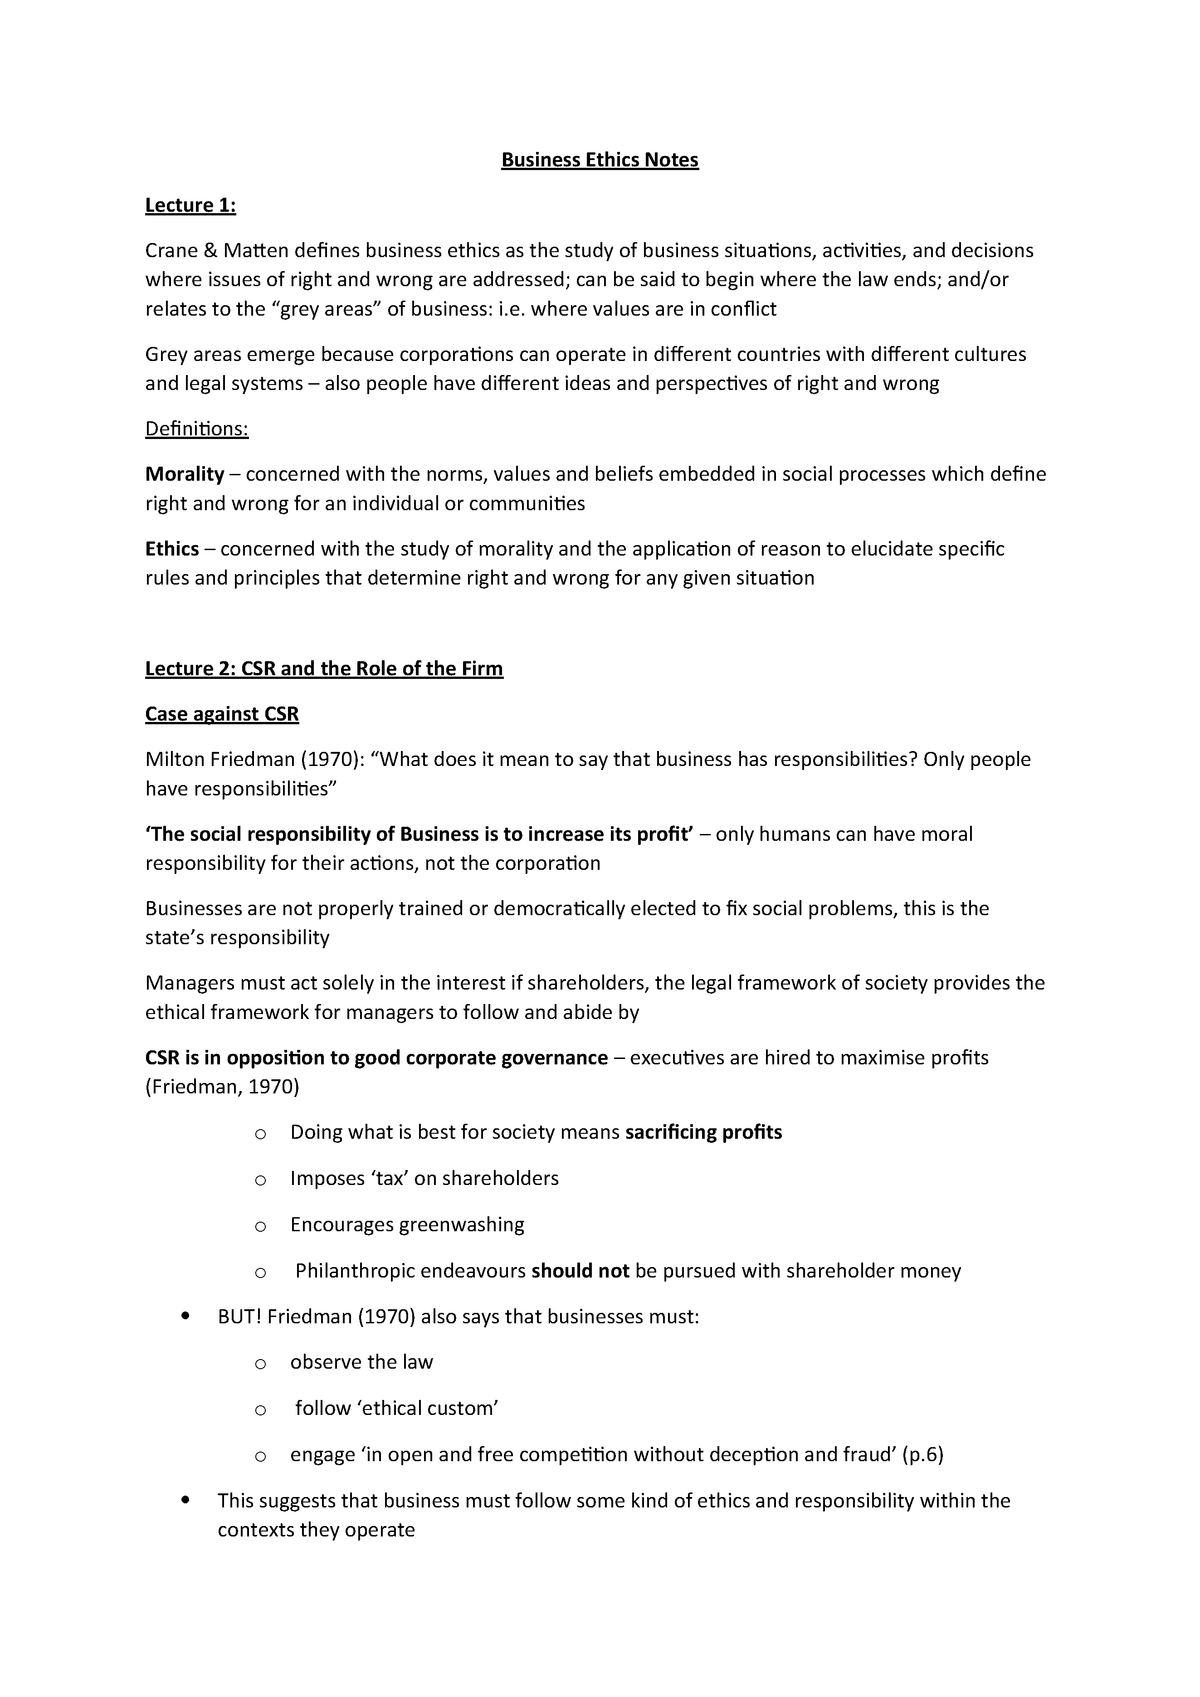 Business Ethics Notes Nottingham Studocu